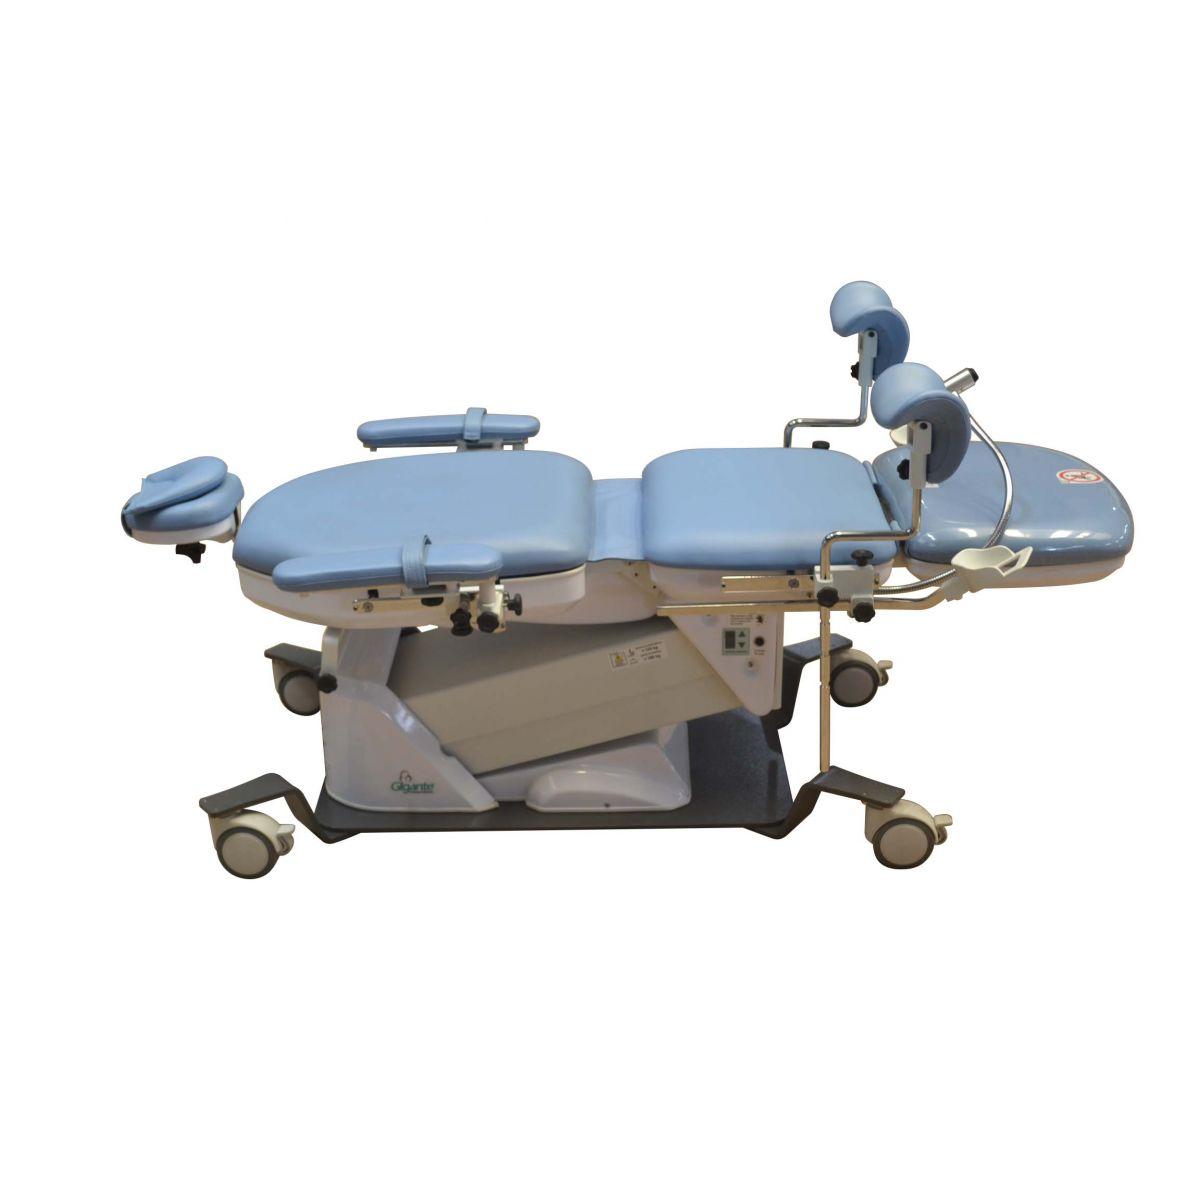 Mesa para Exames Ginecológicos – Mod. CE-9000G - Gigante